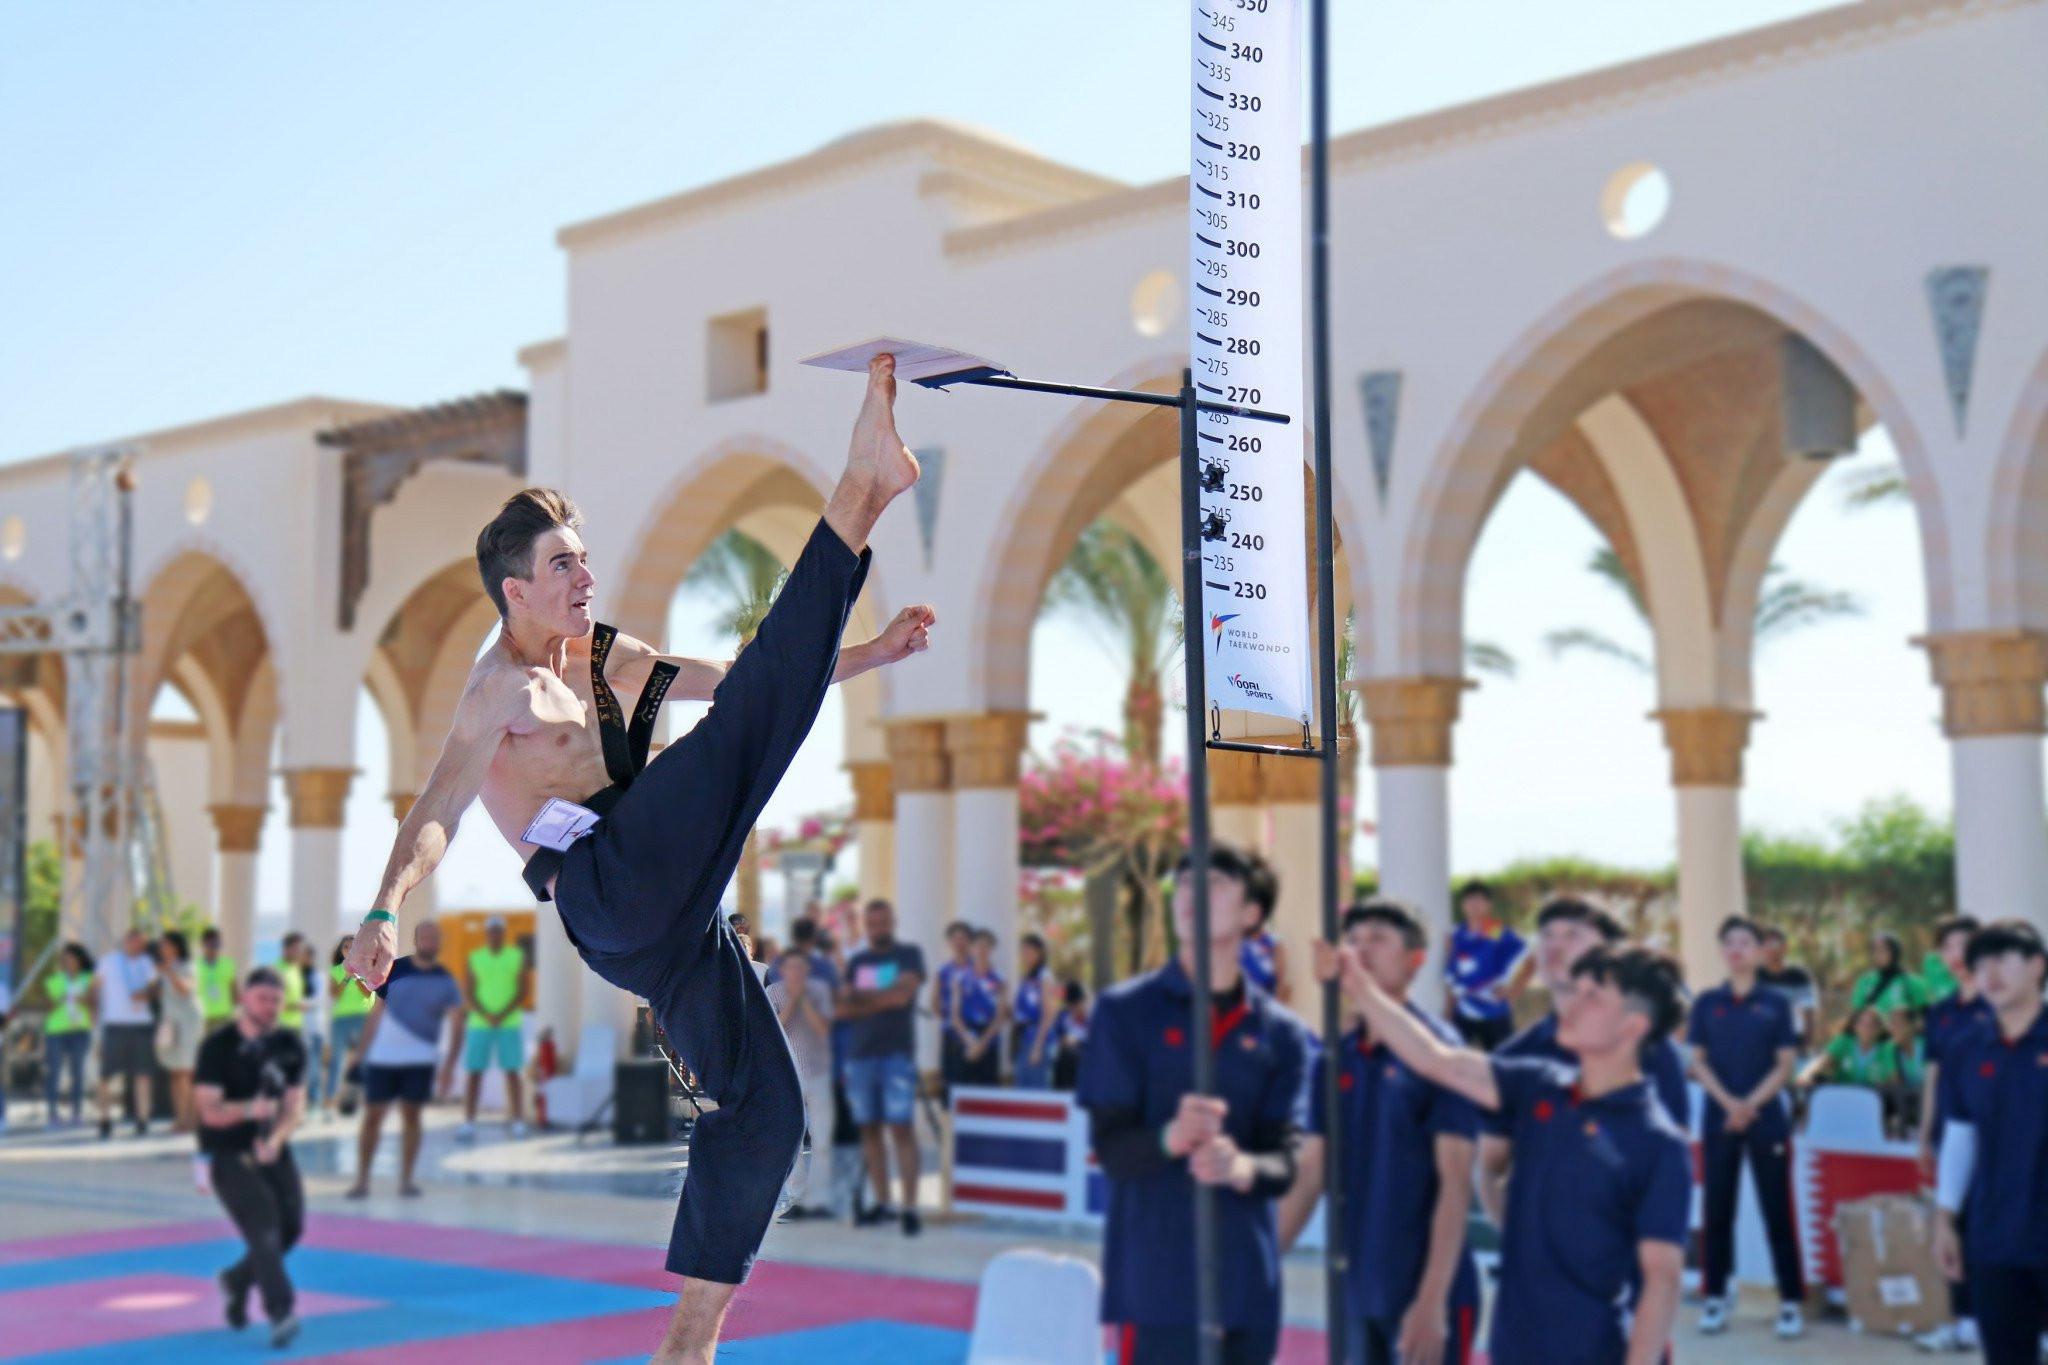 Azza Fouly was head of the Organising Committee for this year's World Taekwondo Beach Championships ©World Taekwondo